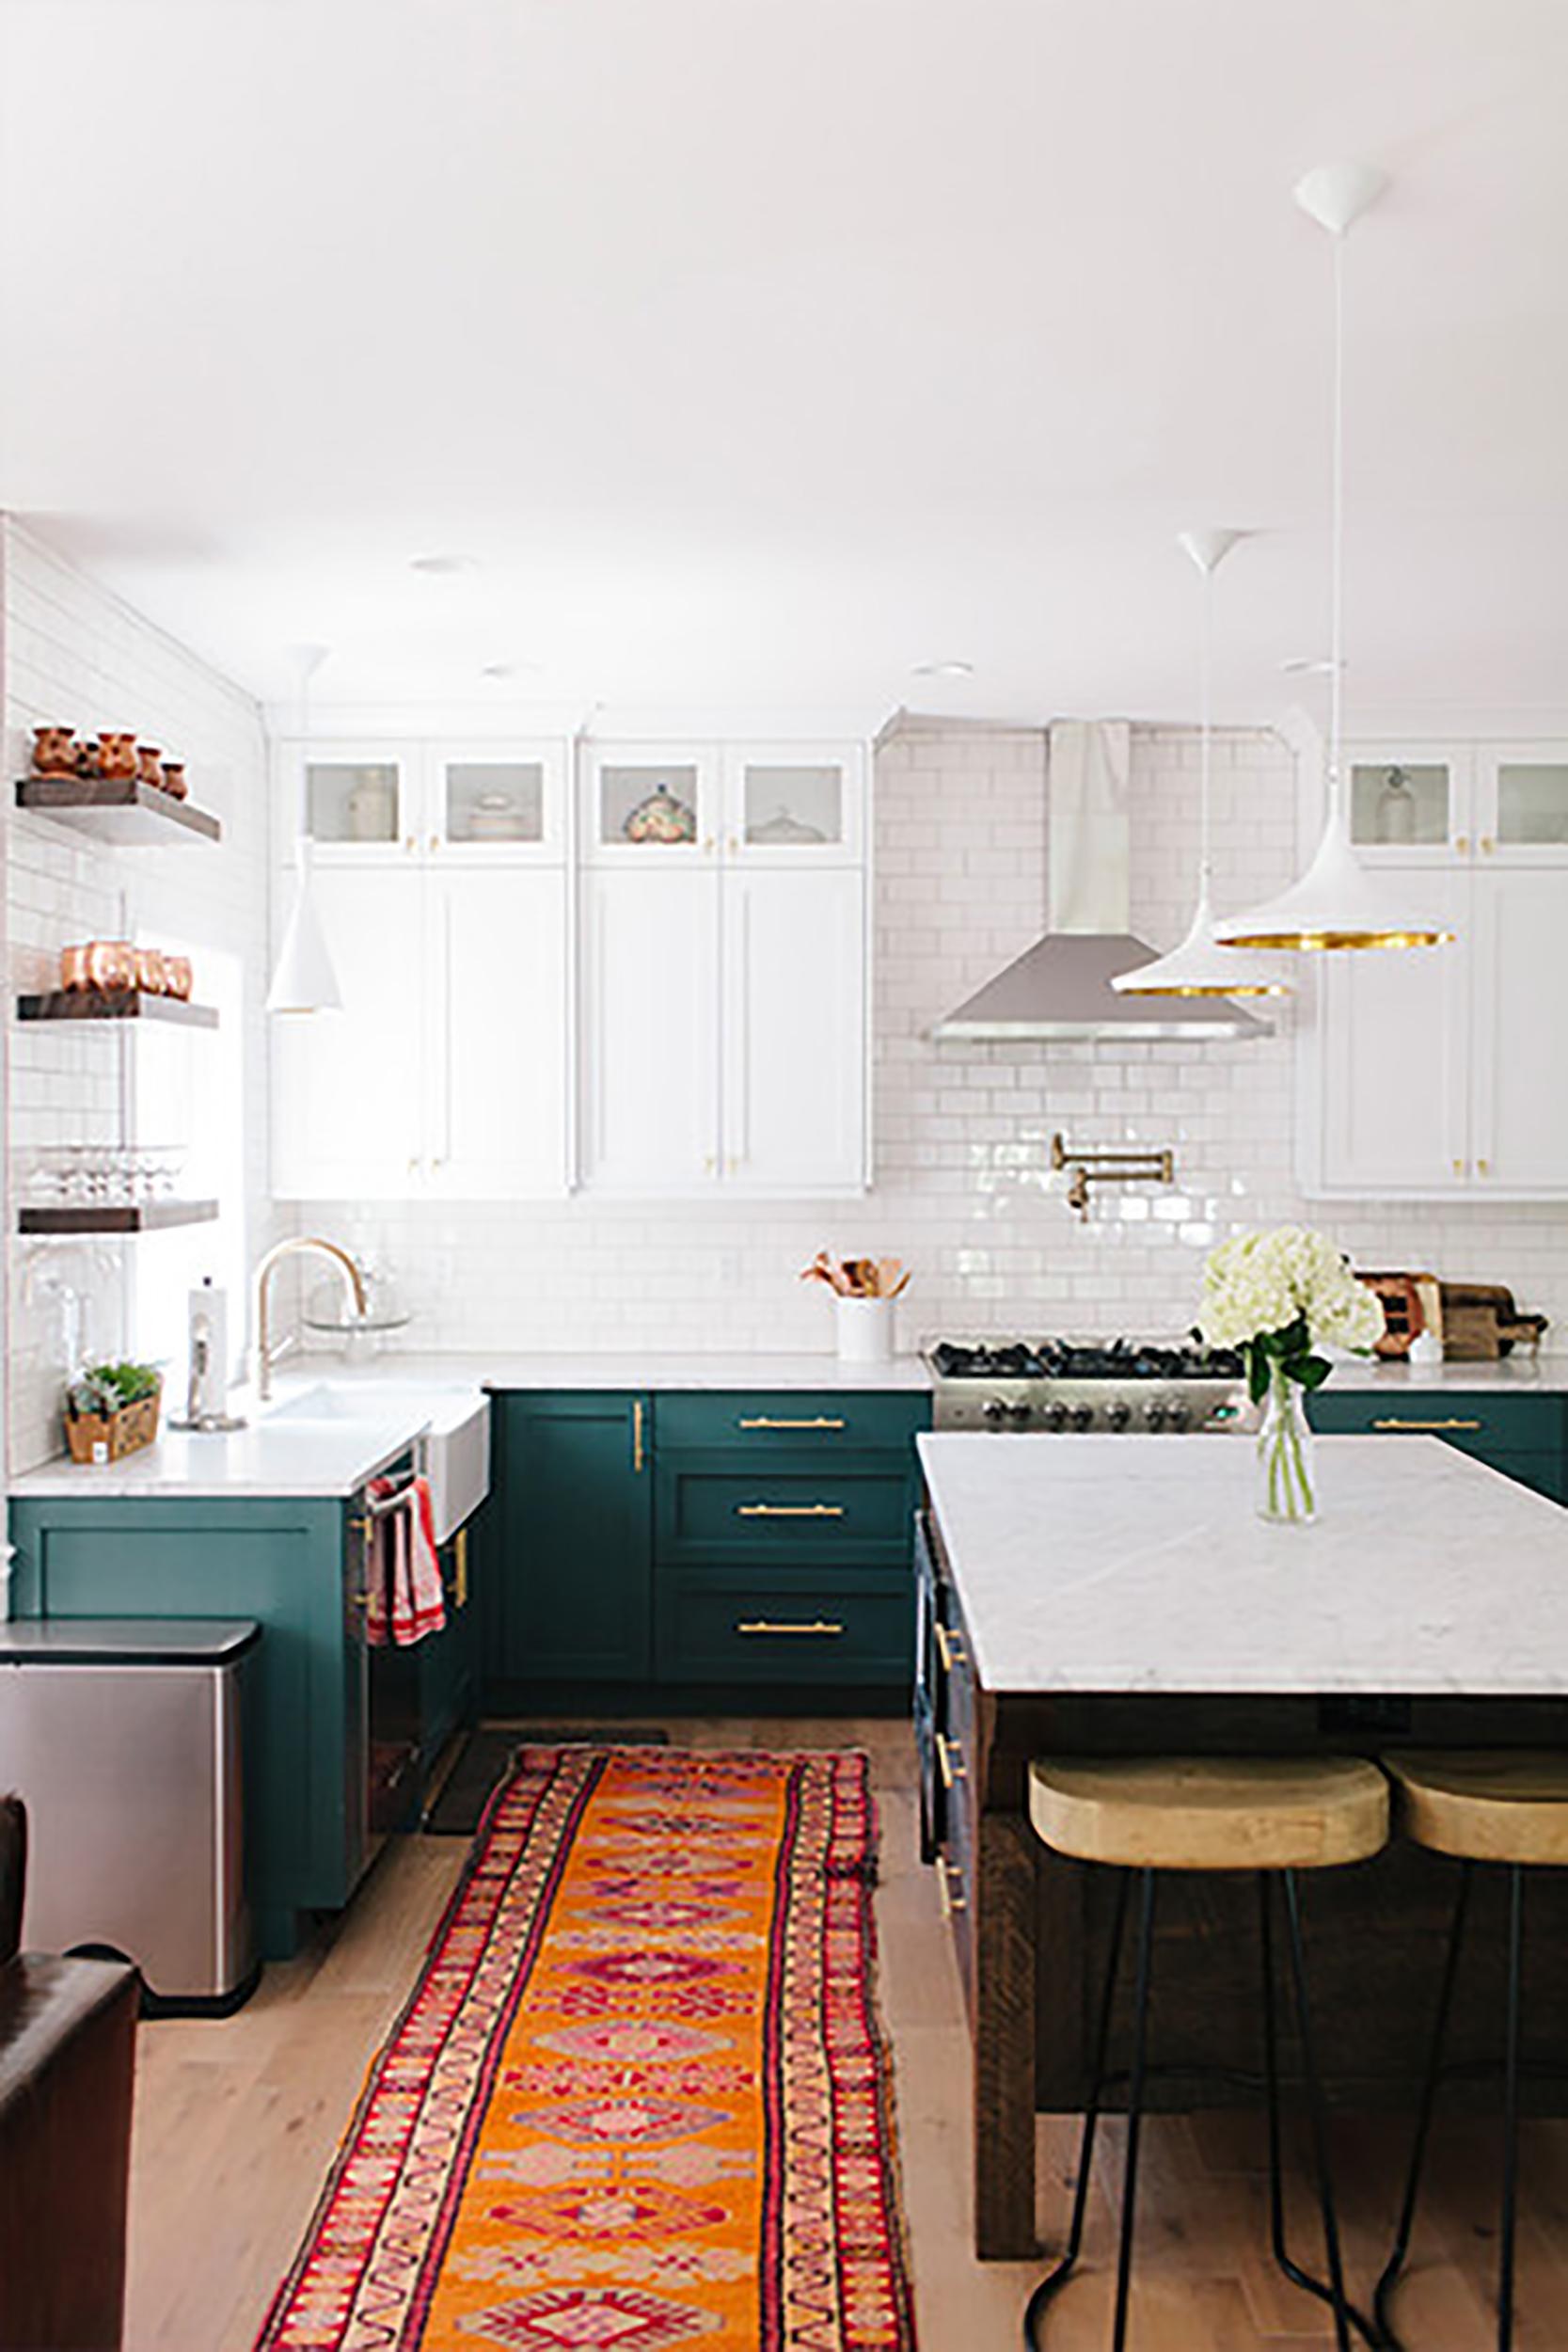 Two Toned Kitchen -Ali Hynek 2.jpg